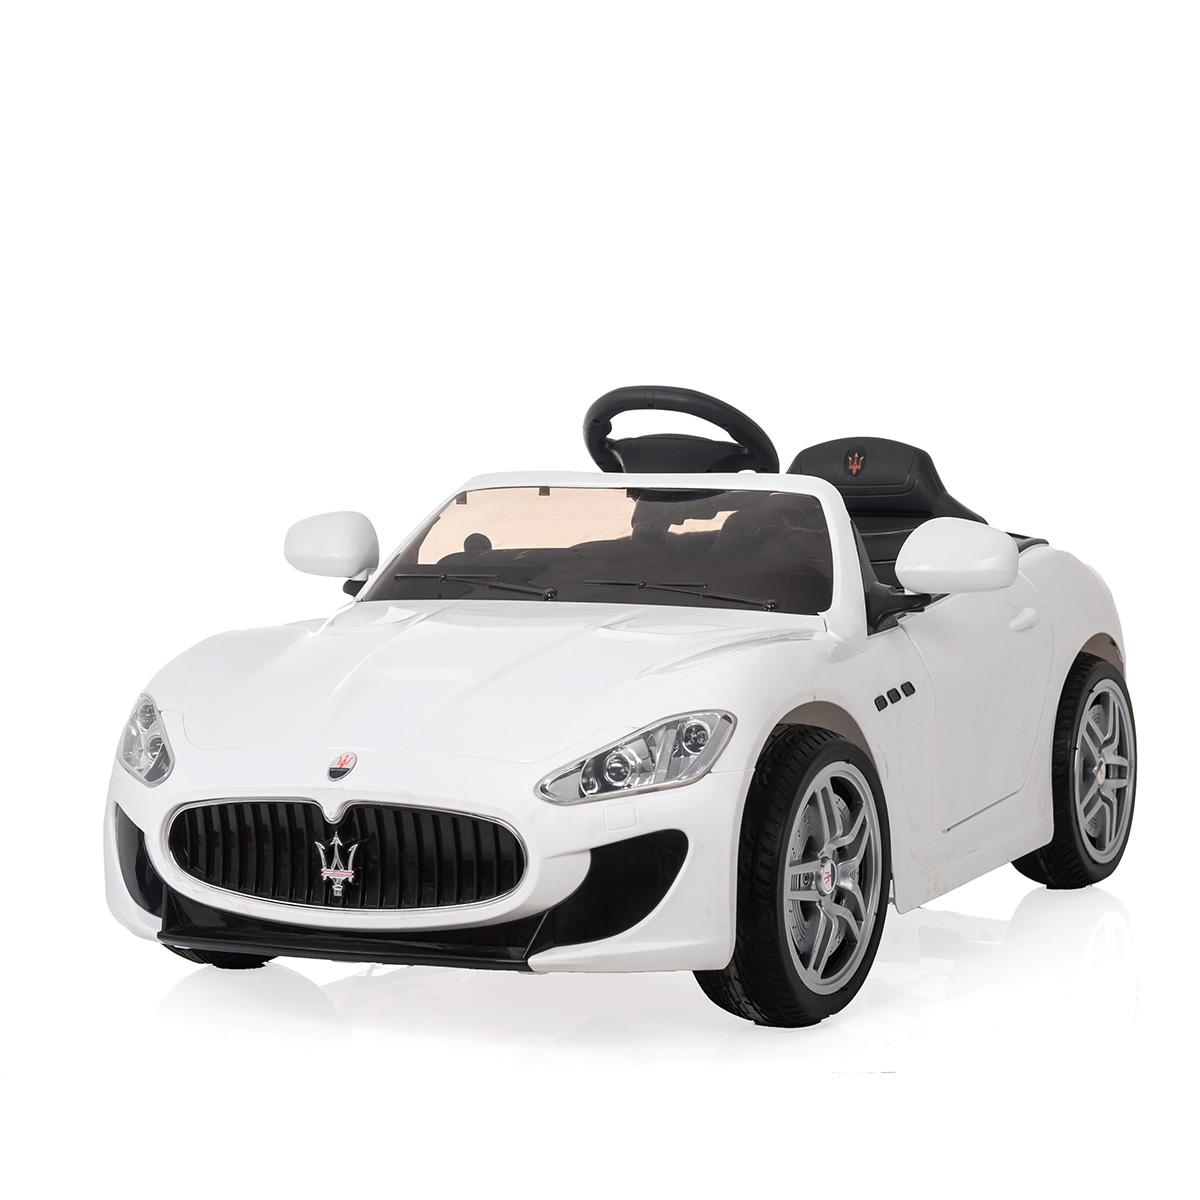 Maserati elbil - Gran Turismo - Hvid